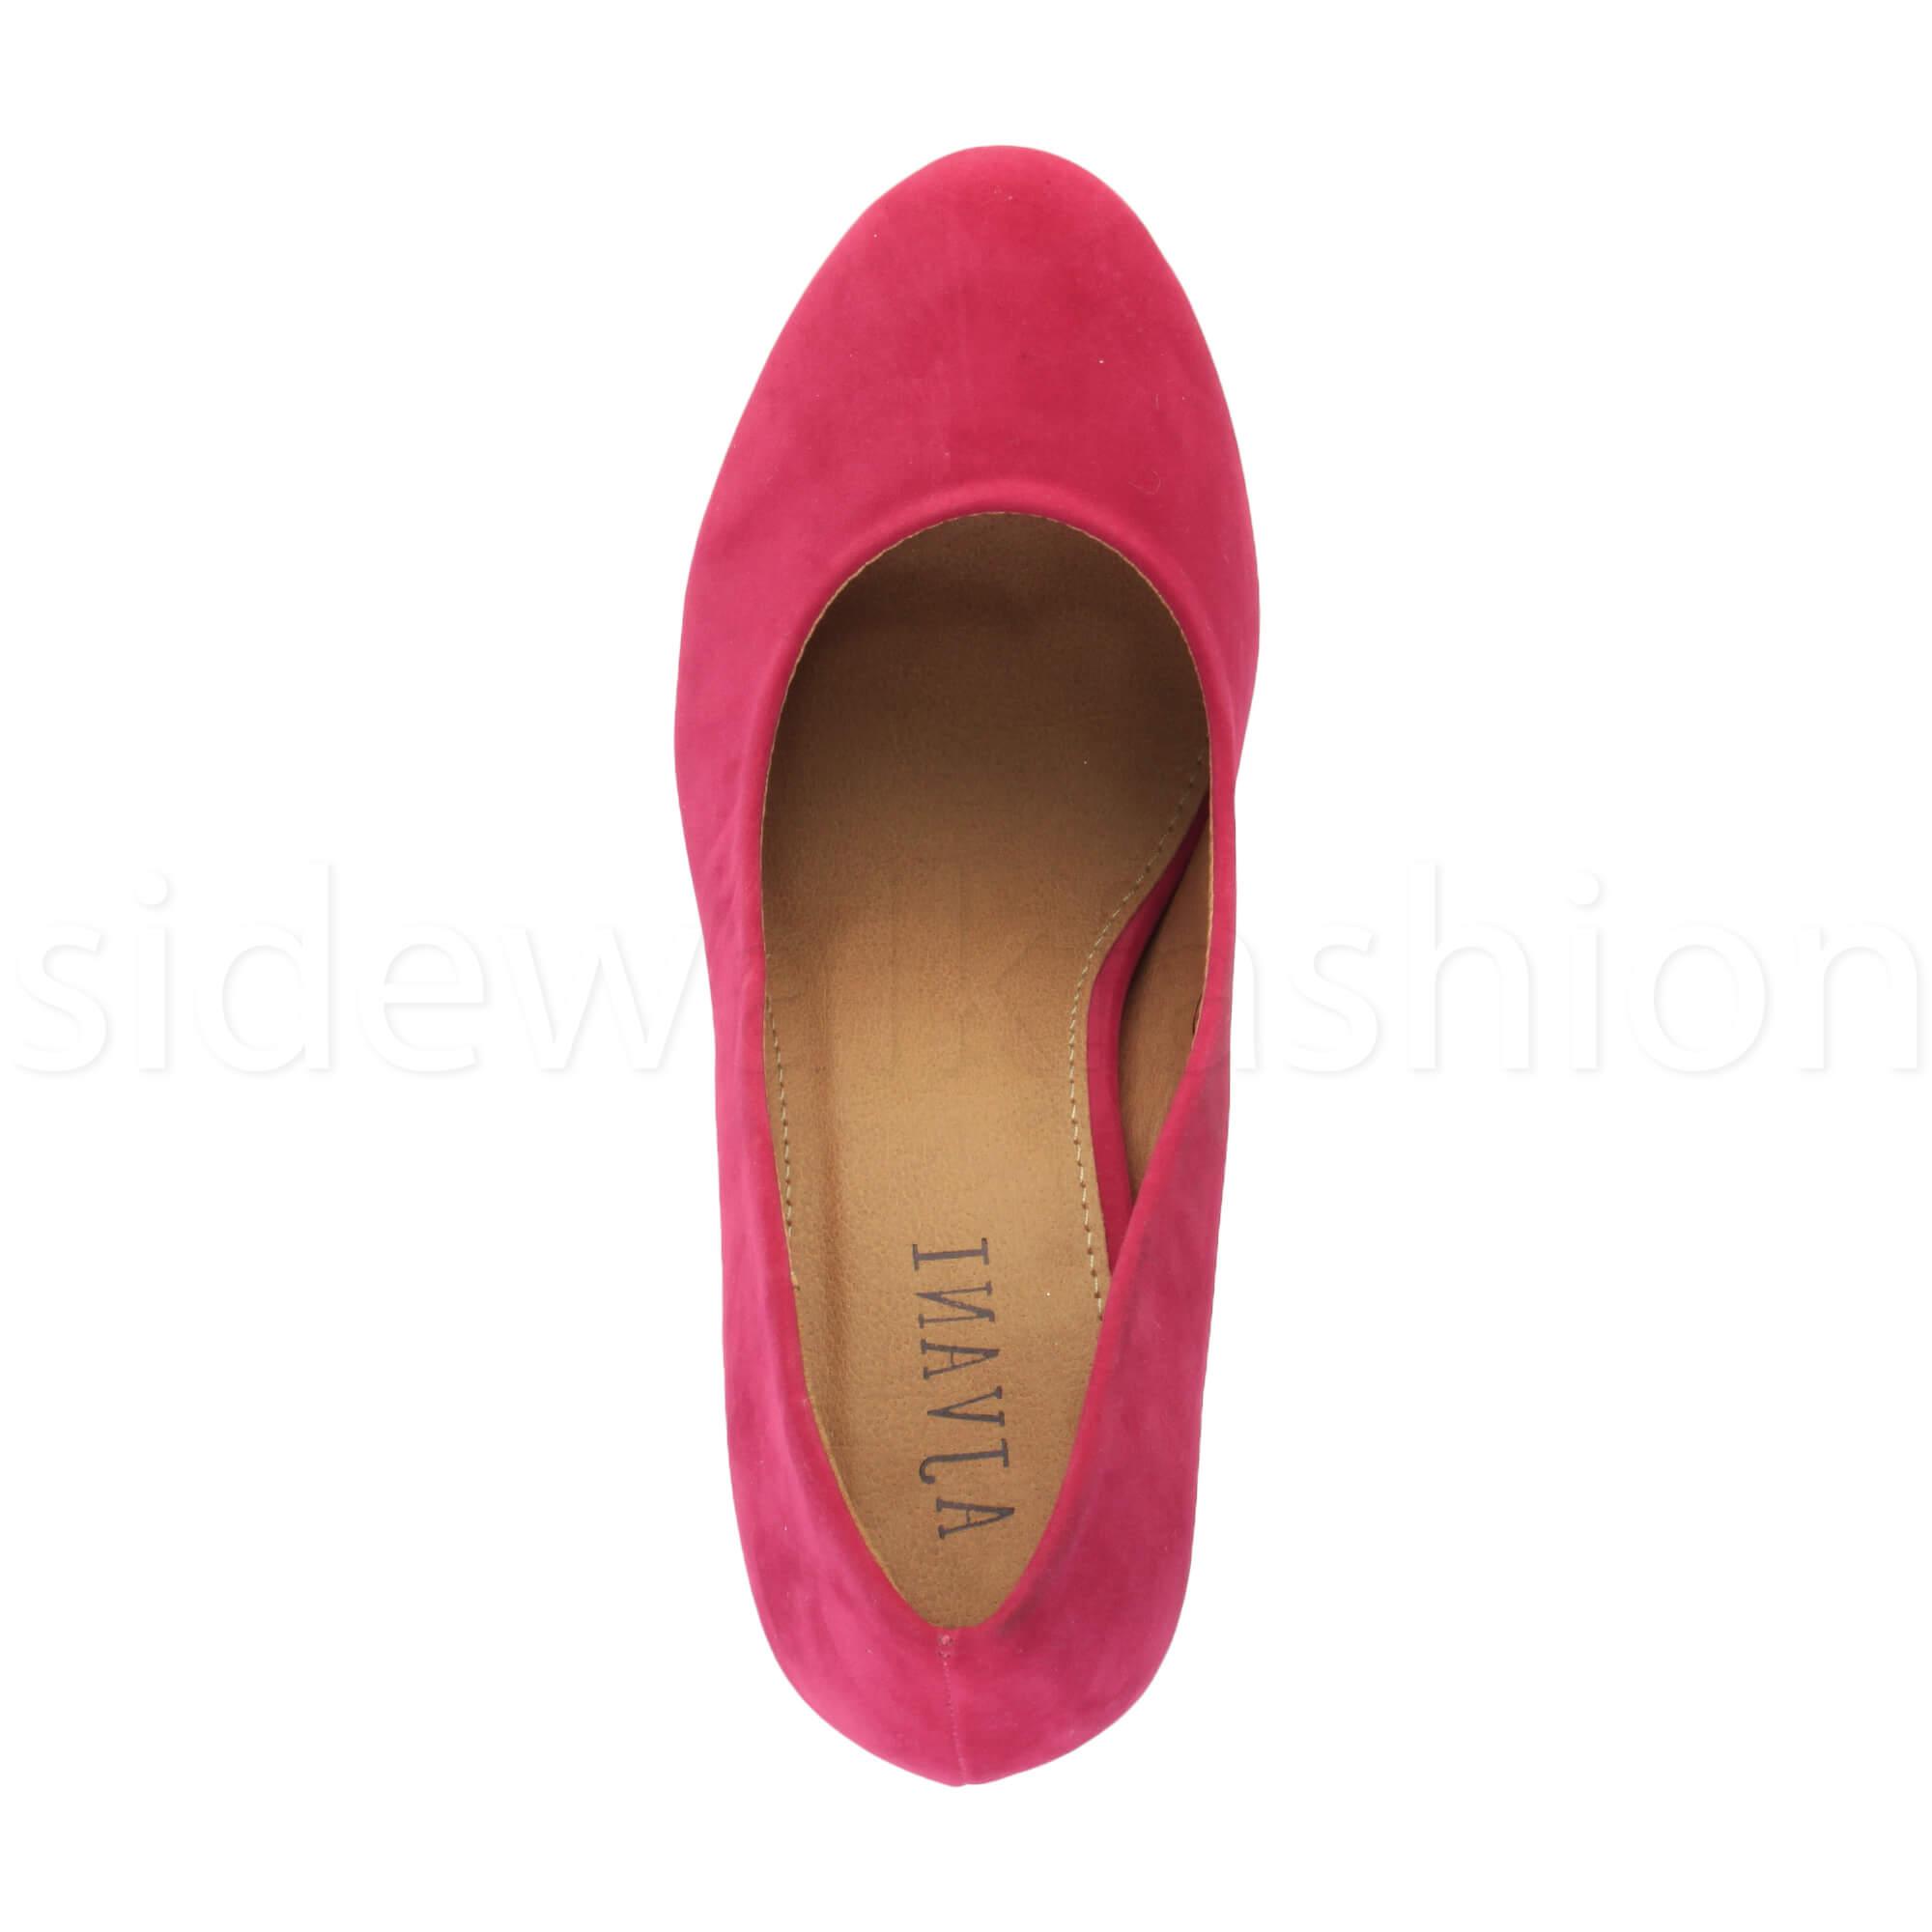 Womens-ladies-high-mid-heel-platform-wedding-evening-bridesmaid-court-shoes-size thumbnail 56